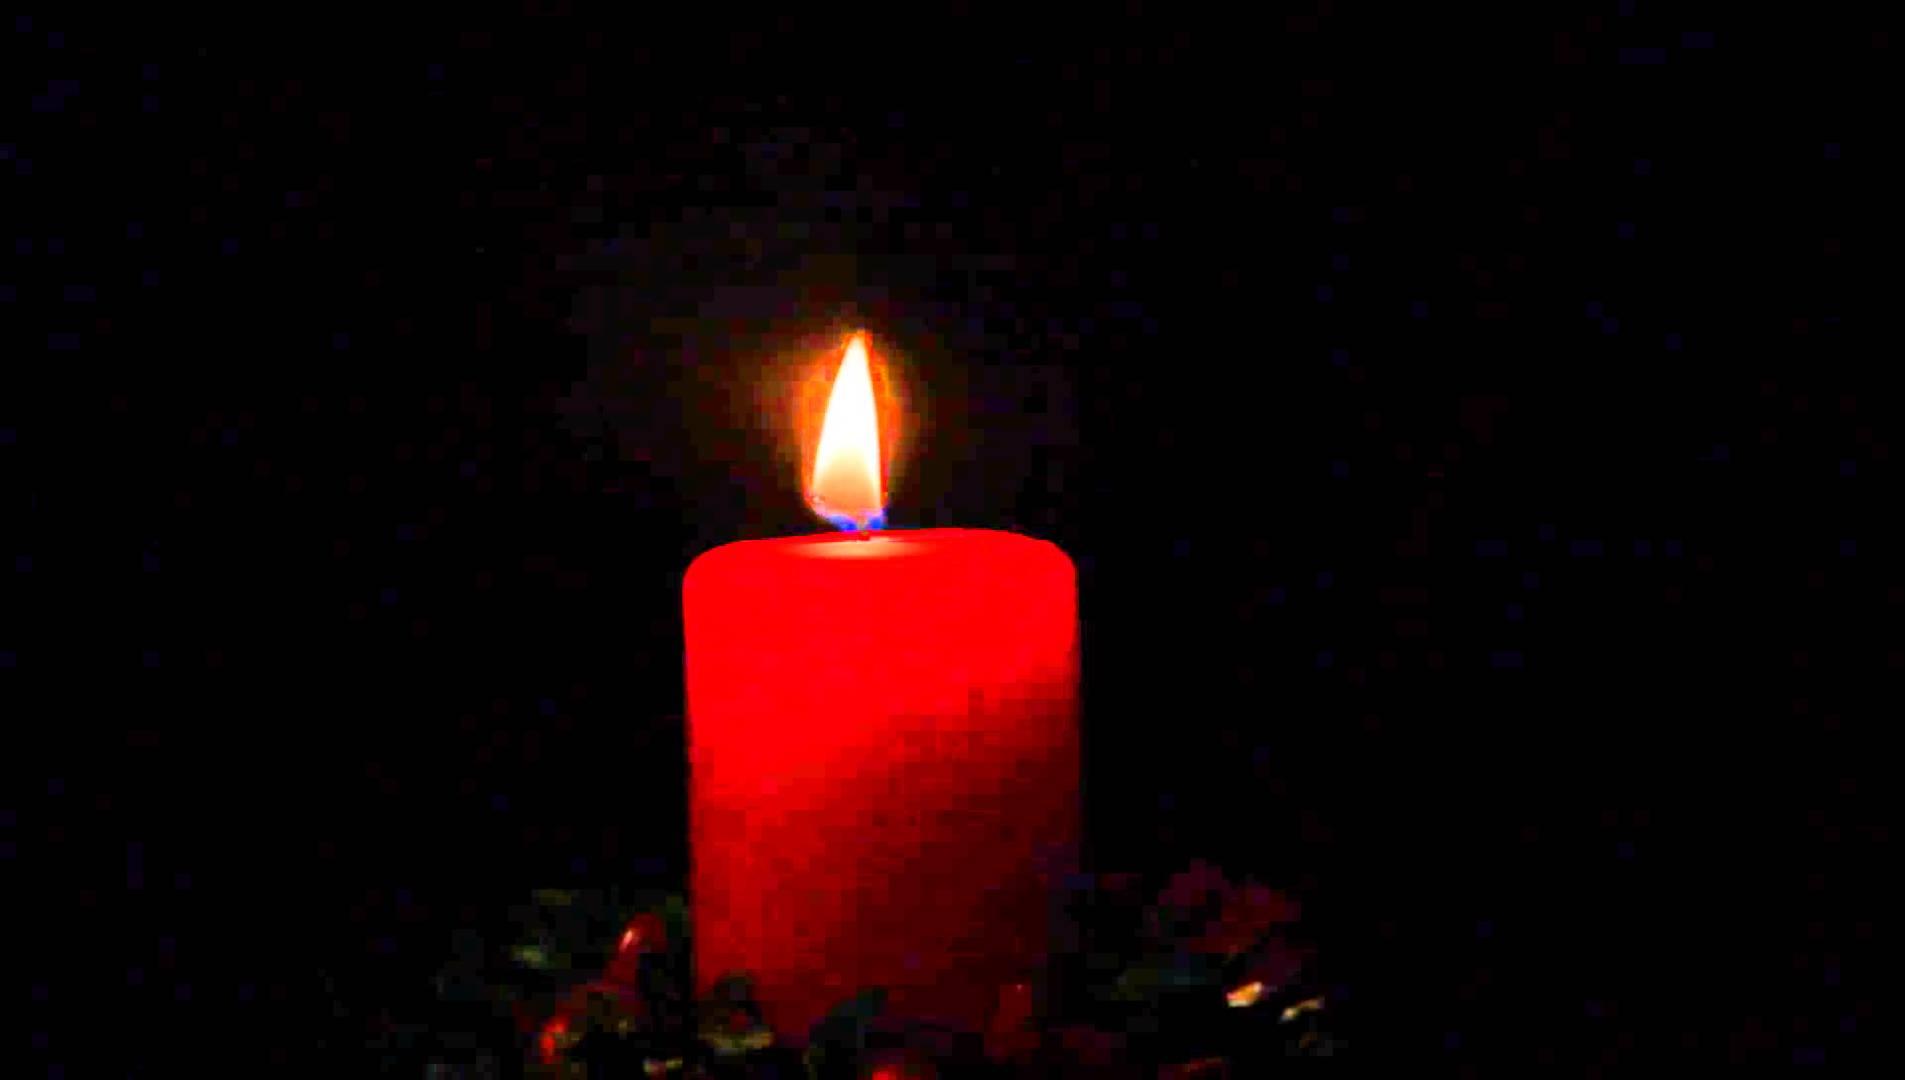 red candle burning - YouTube